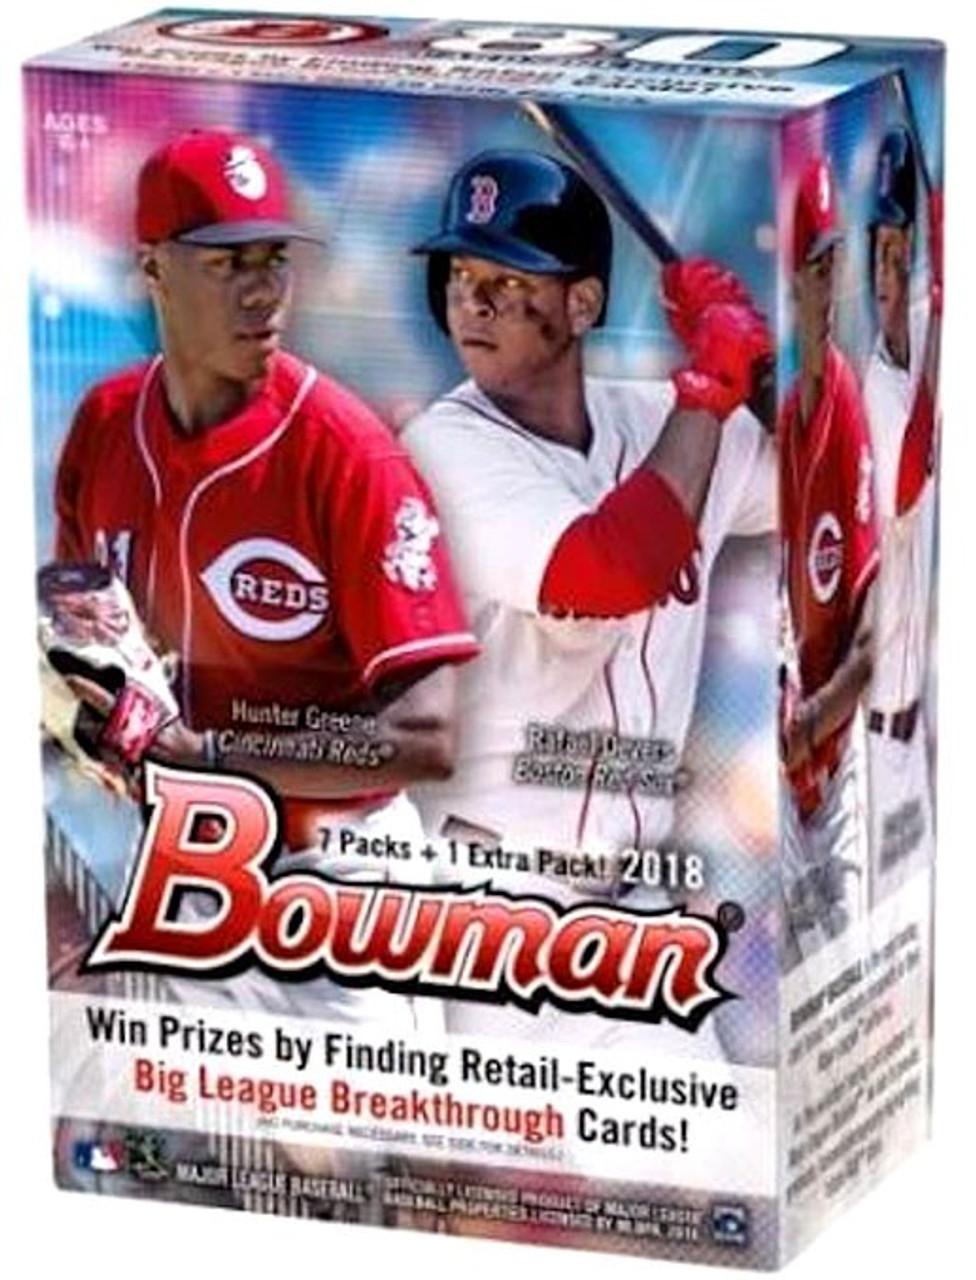 Mlb 2018 Bowman Baseball Trading Card Blaster Box 8 Packs